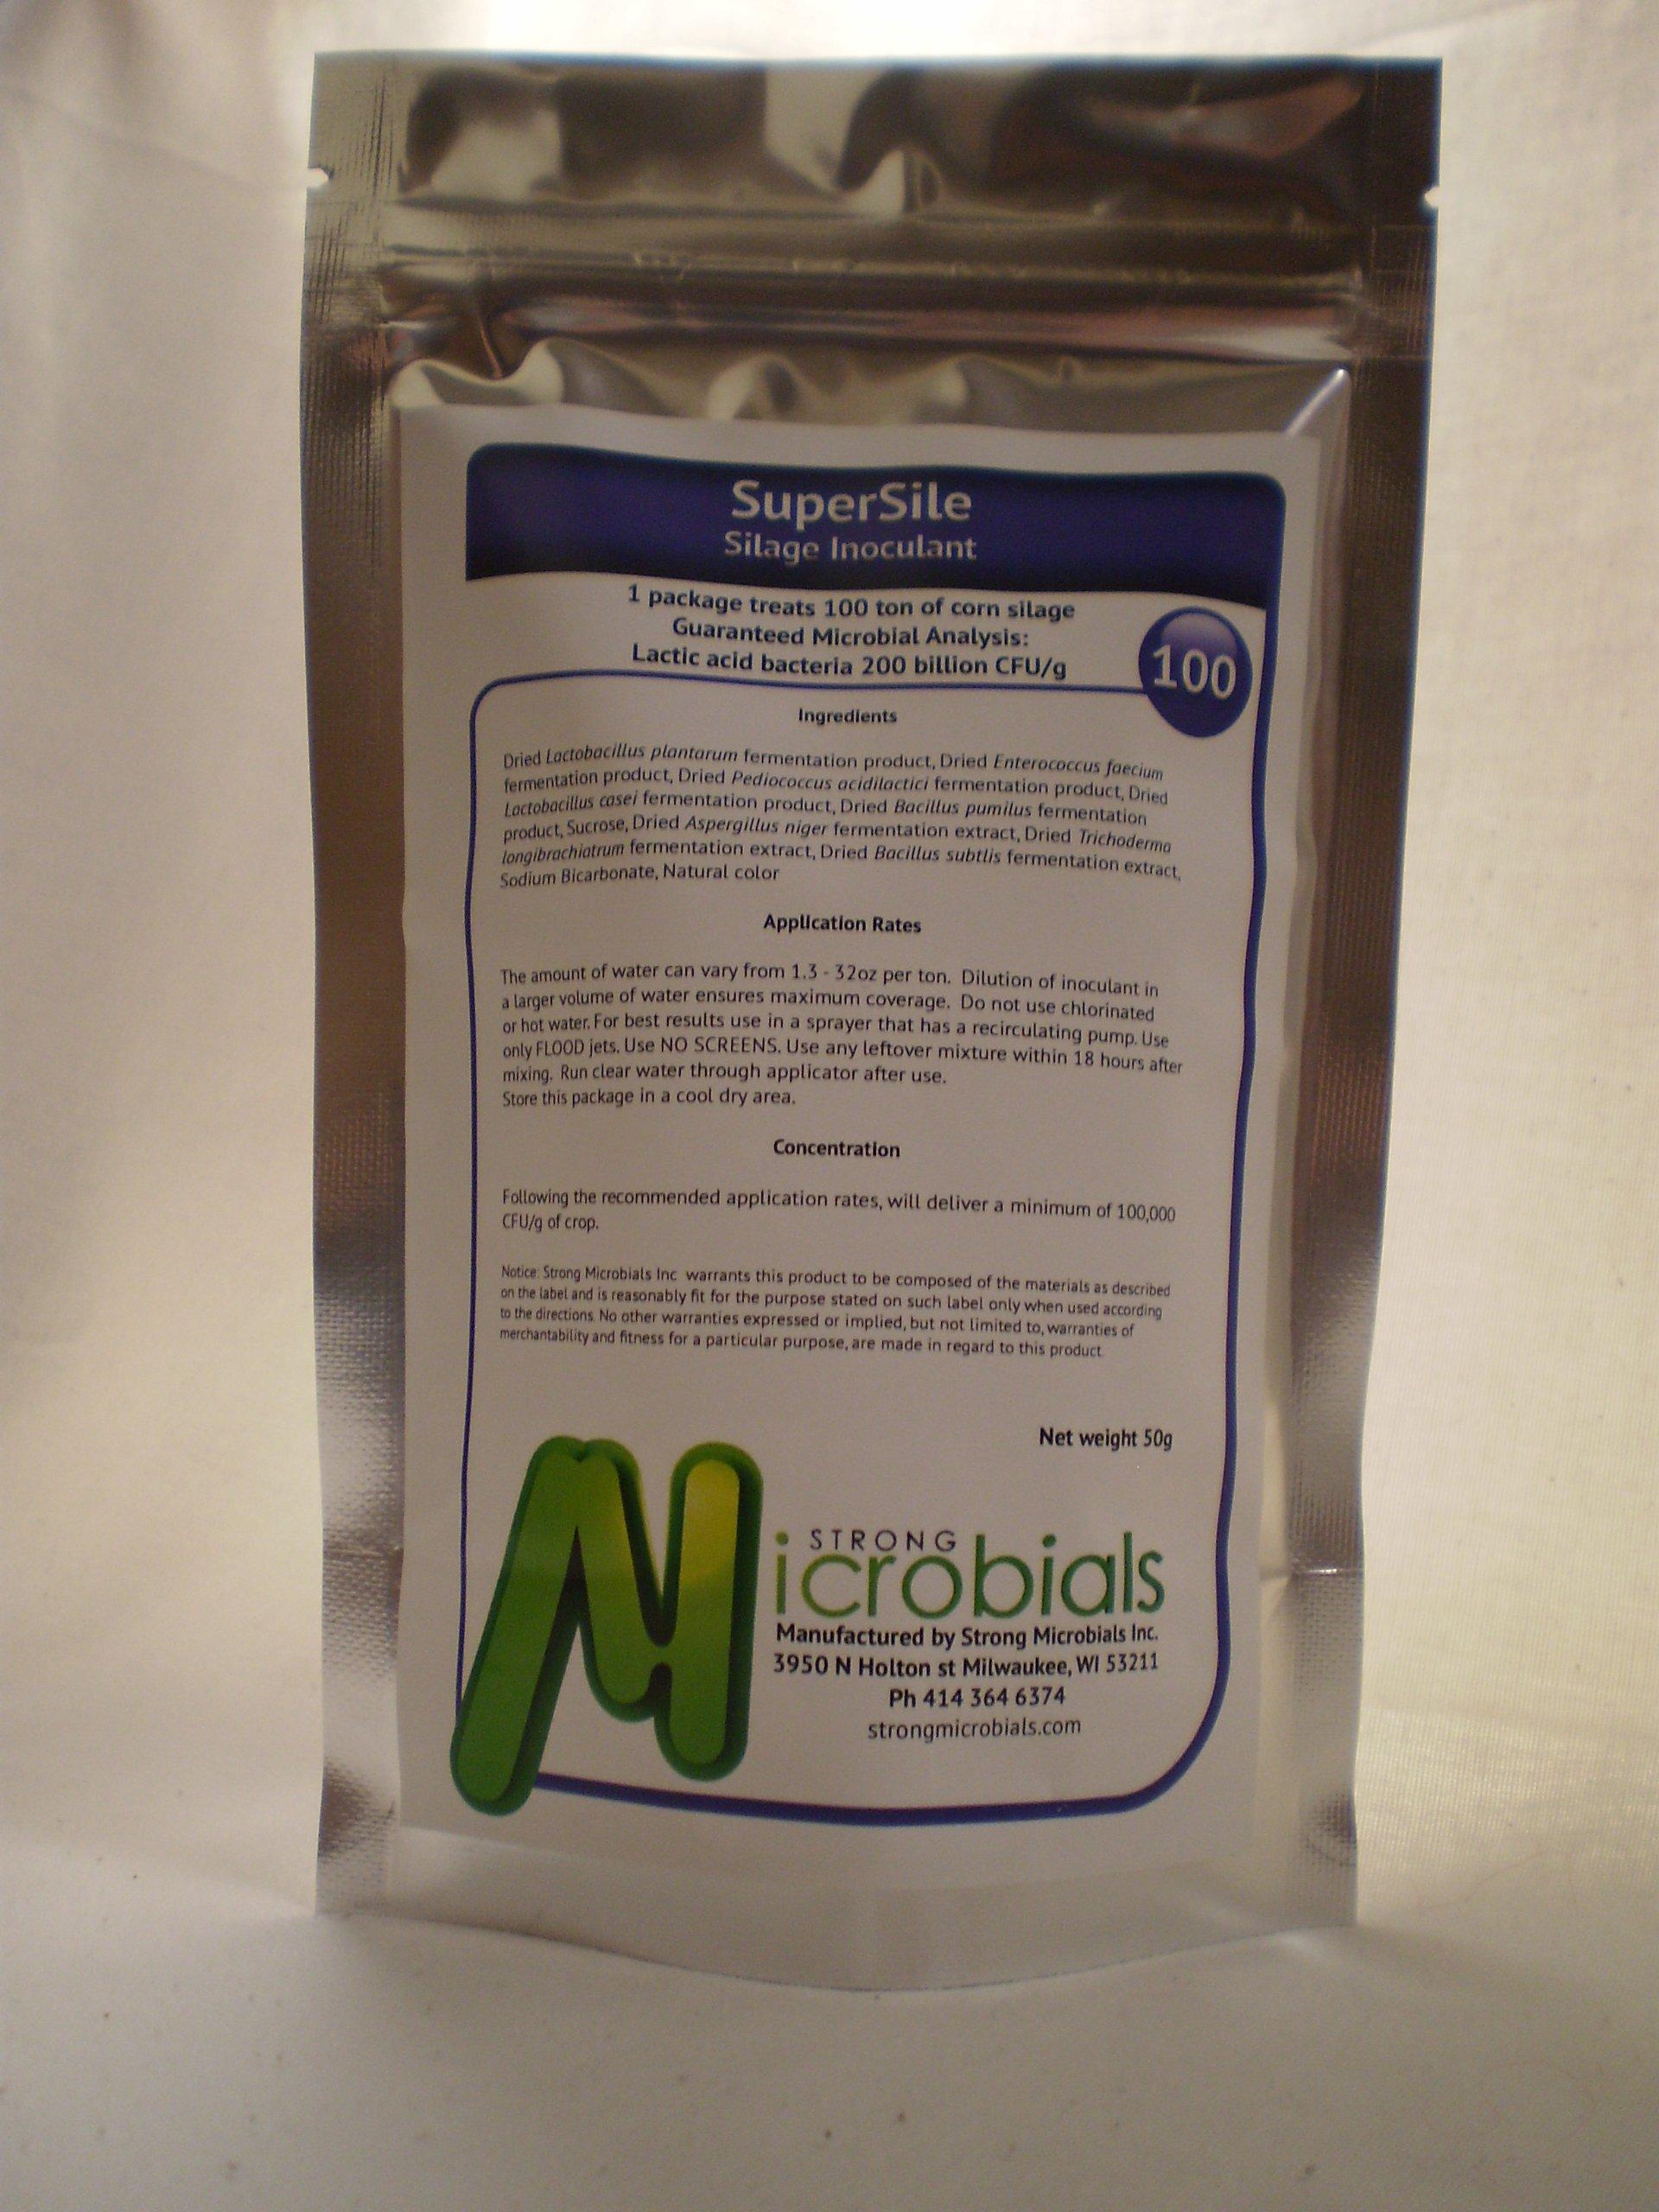 SuperSile Silage Inoculant 100 ton treatment by SuperSile